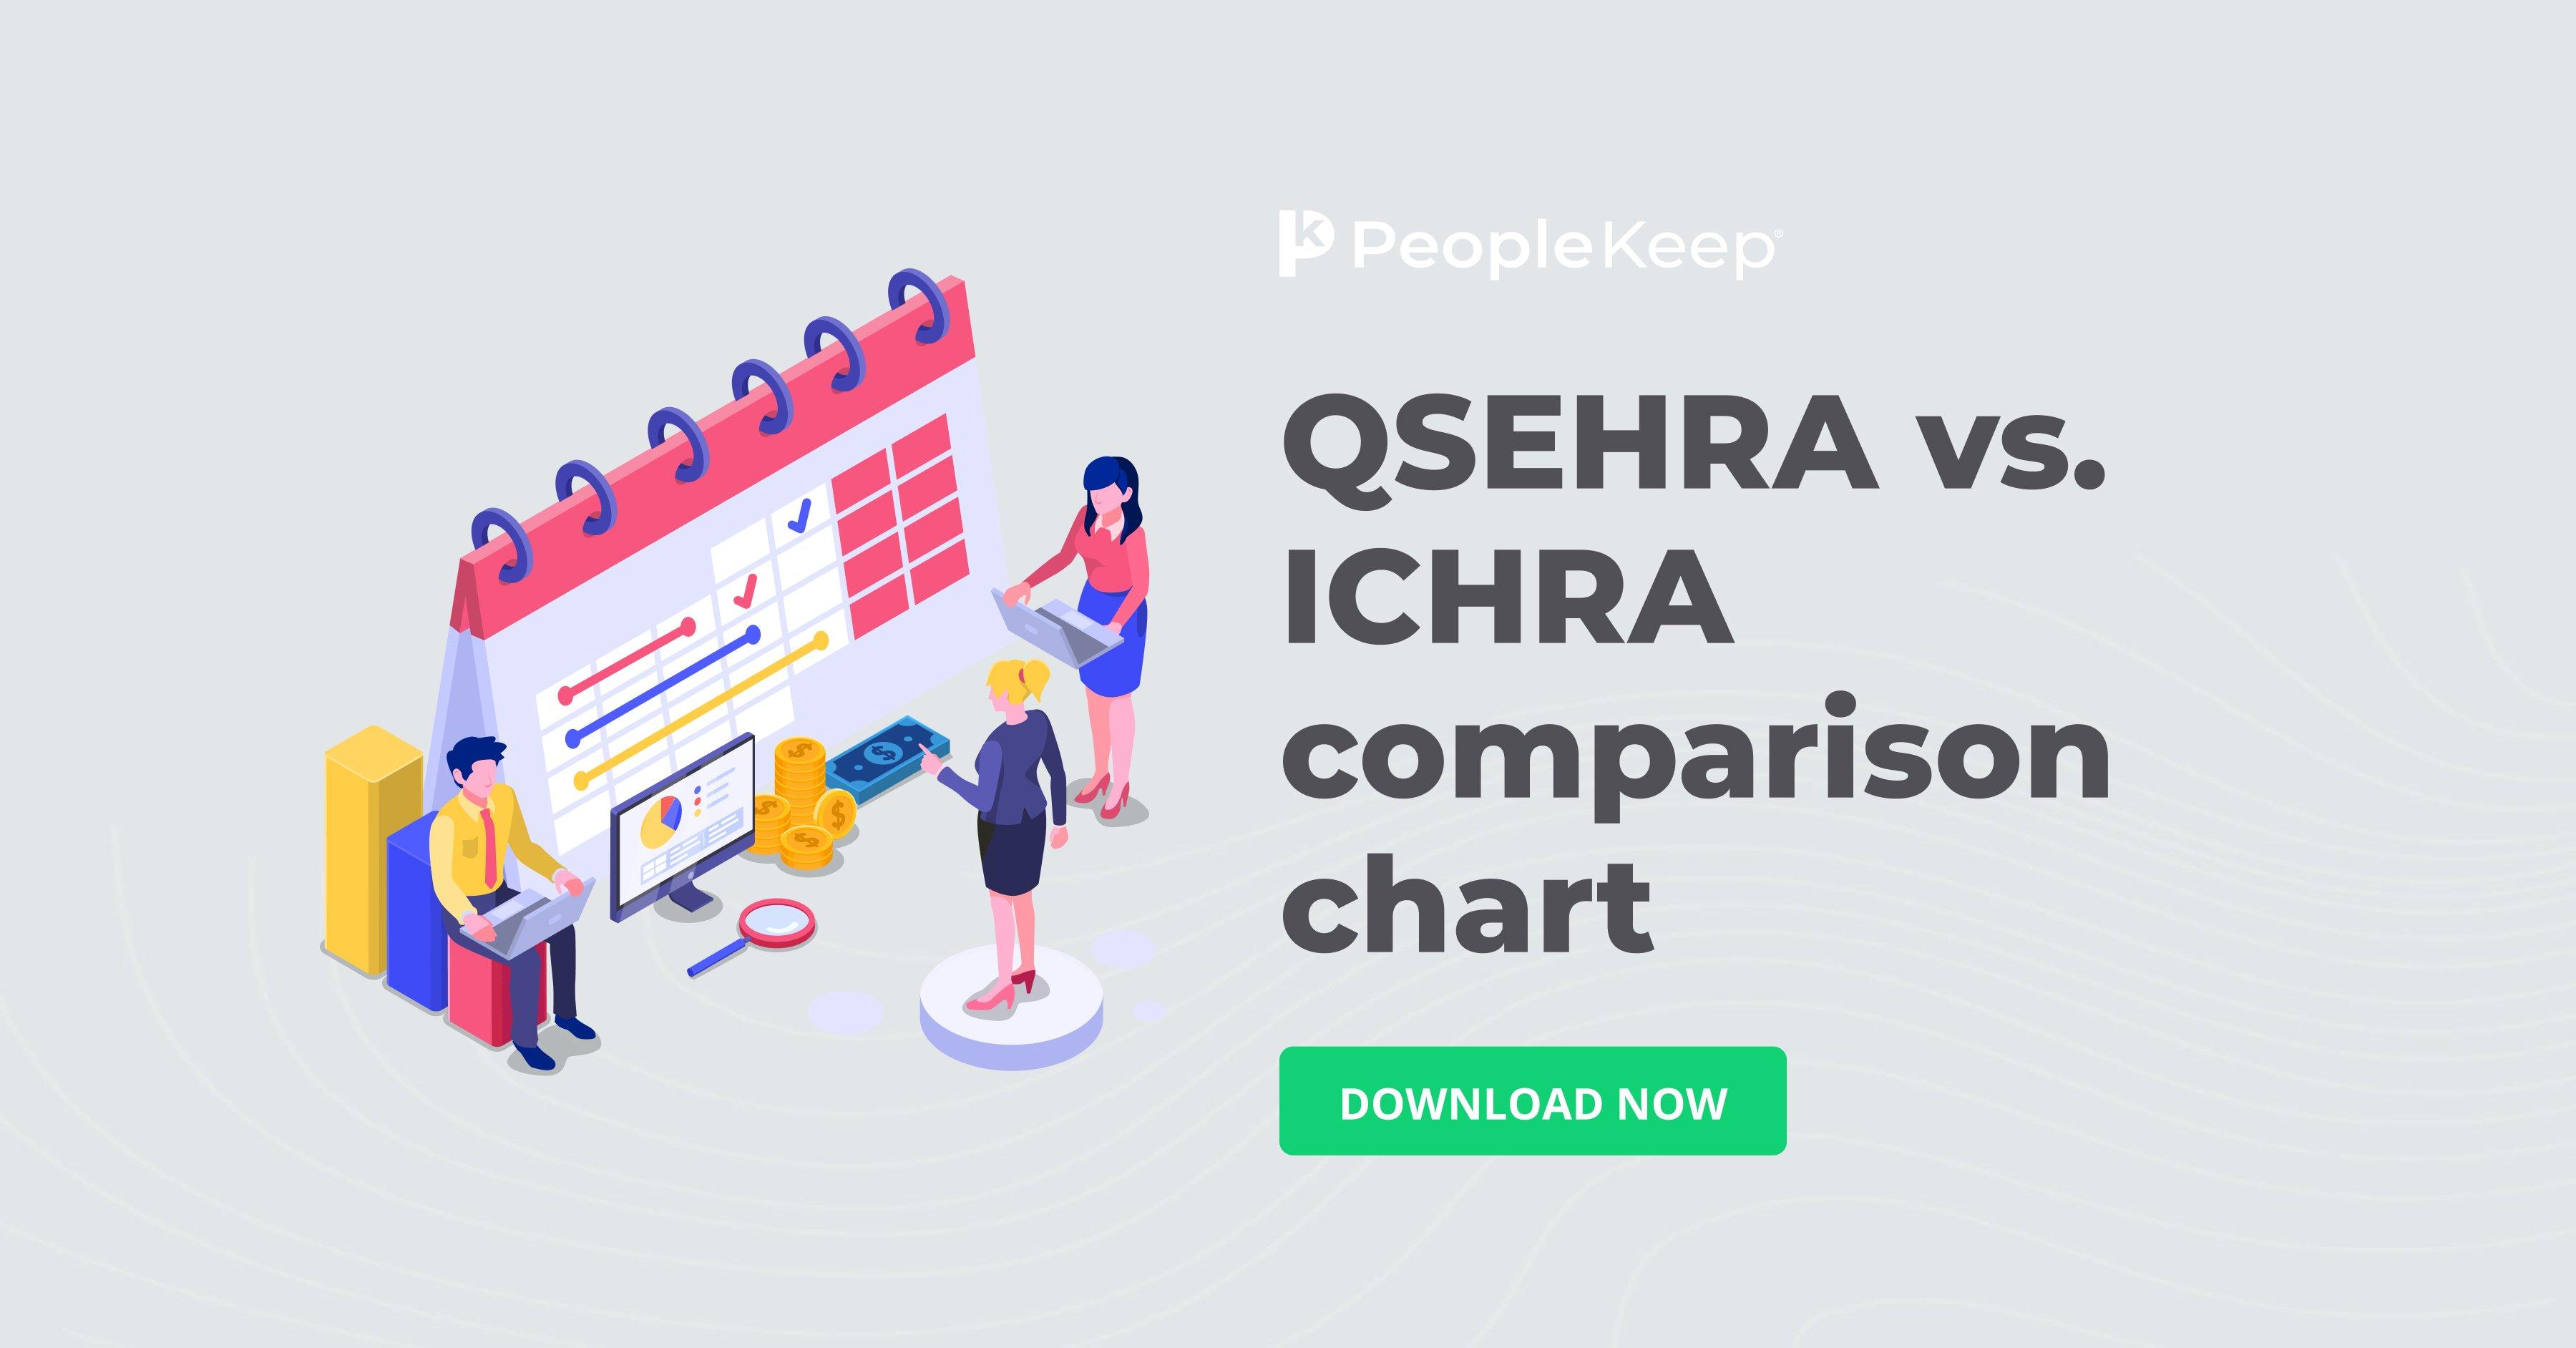 qsehra vs ichra comparison chart_fb